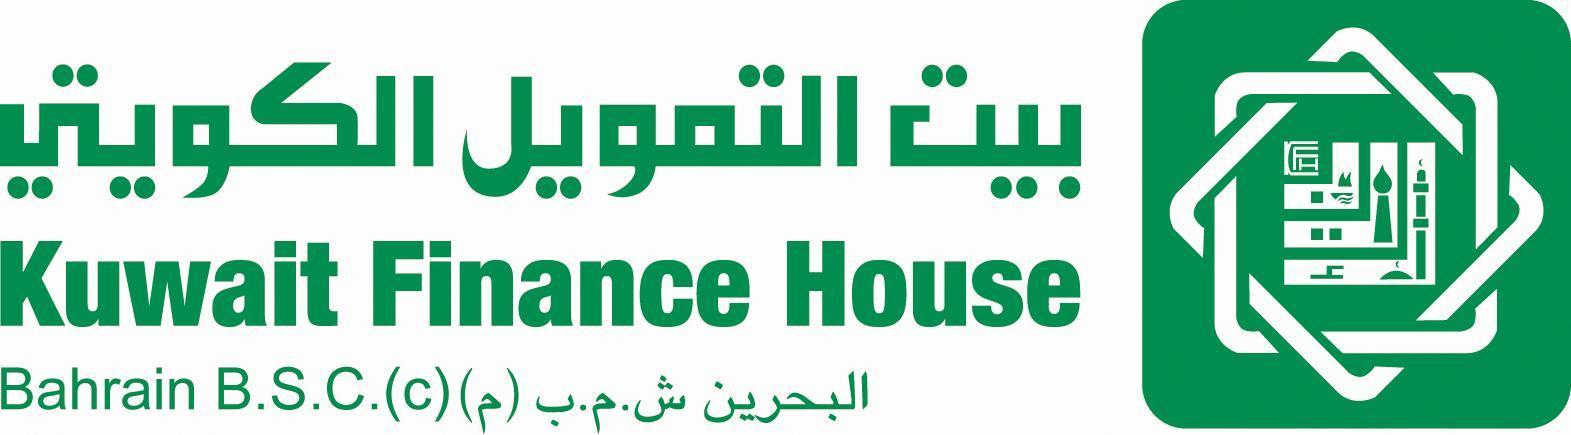 ISLAMIC FINANCIAL PARTNER